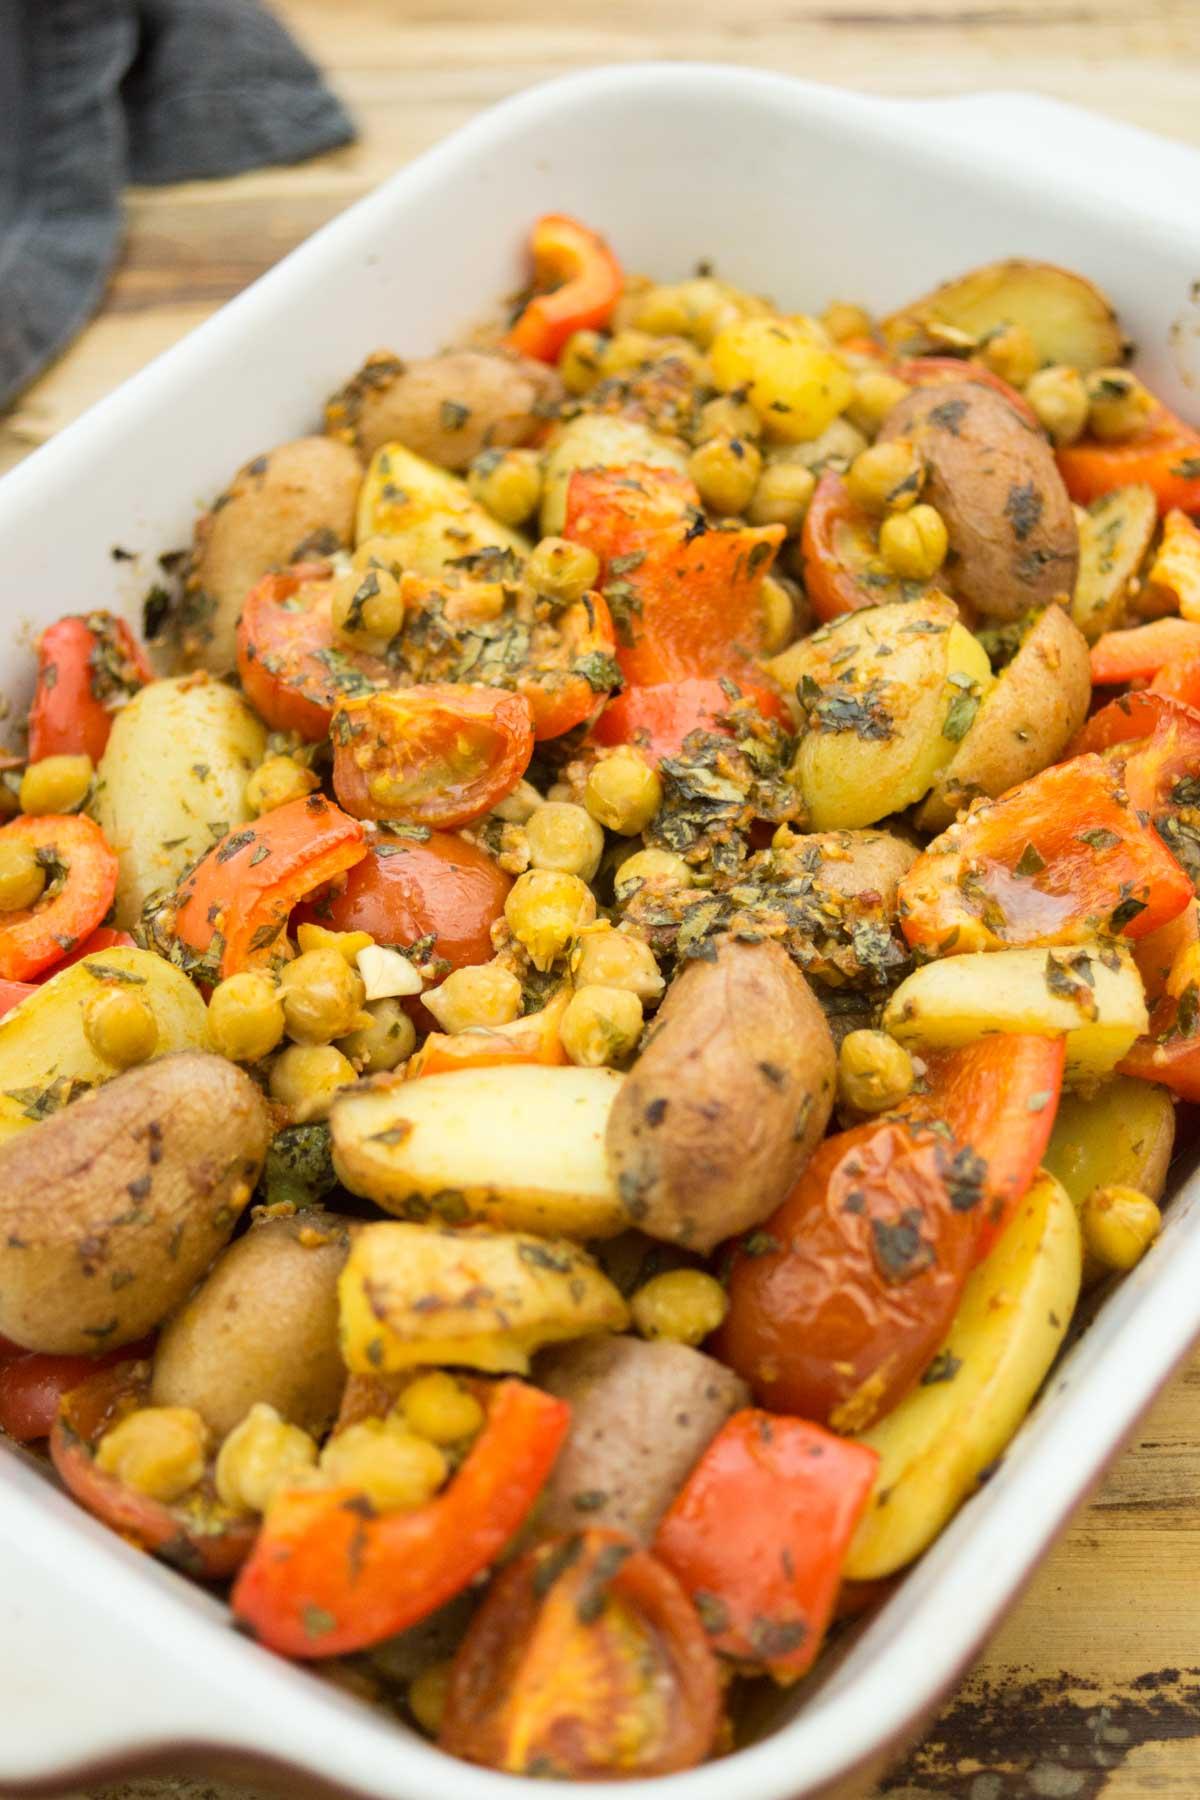 würziges Kartoffel-Tajine mit Kichererbsen, Tomaten, roter Paprika und Petersilie Rezept